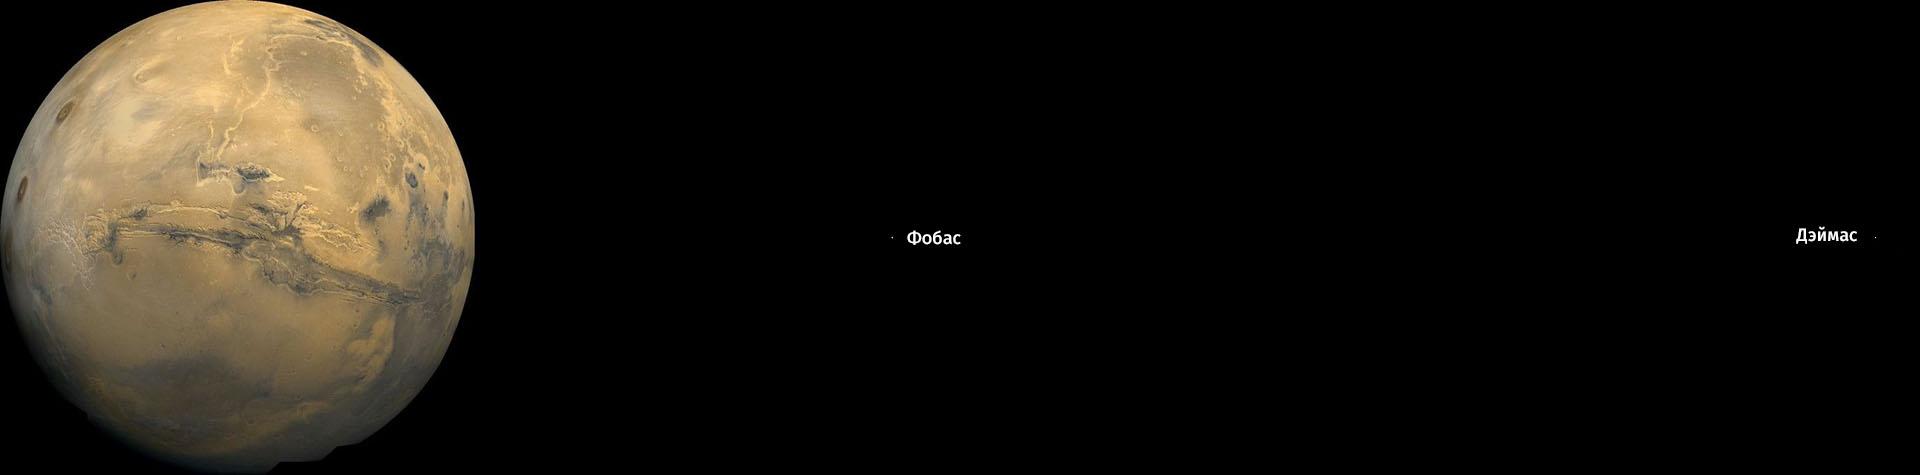 by48-spadarozhniki-planet-zyamnoj-grupy_12